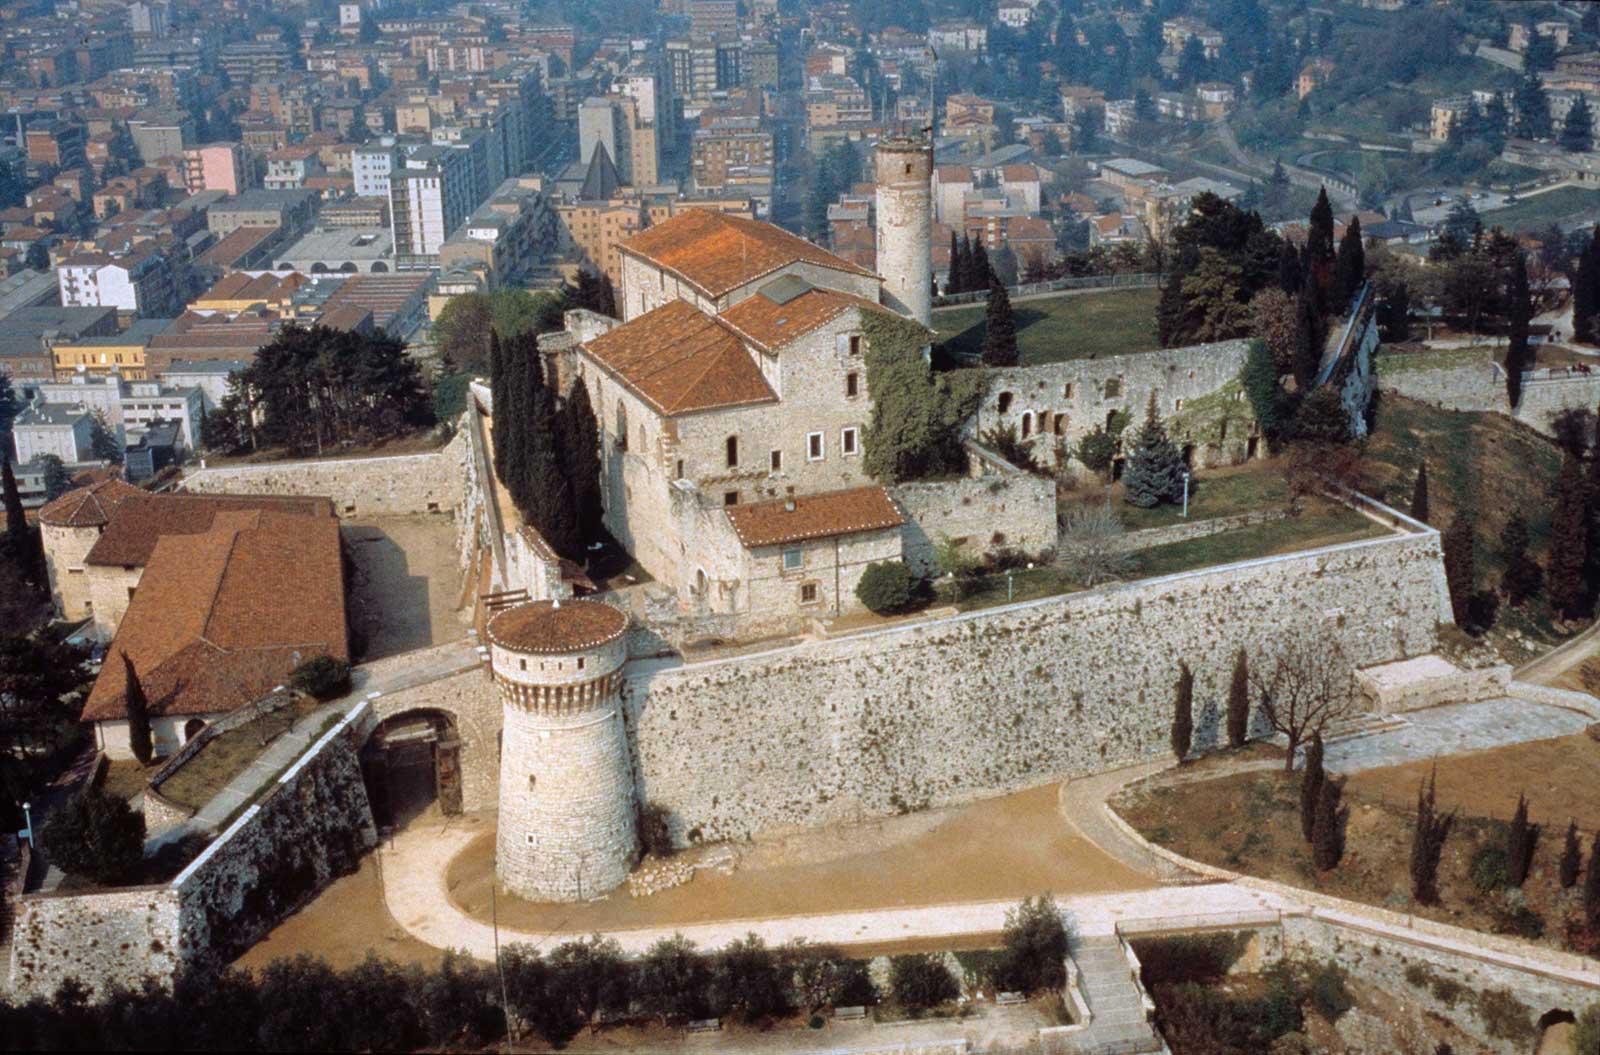 Brescia_7394.jpg